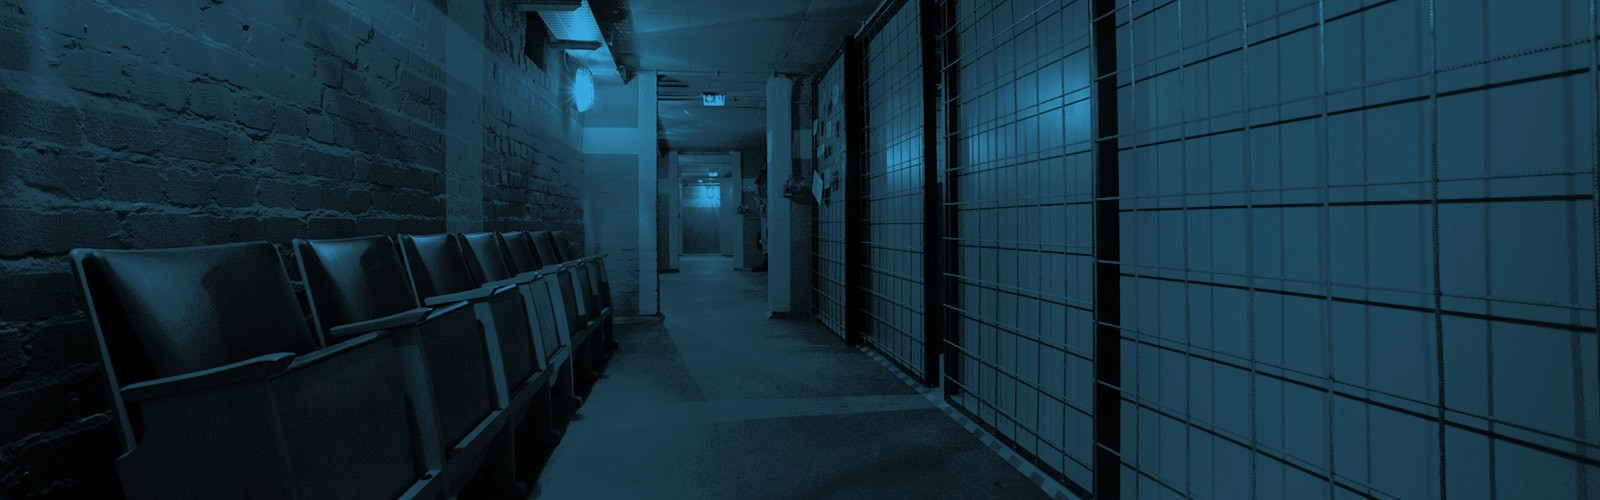 Escape Game, Exit Berlin, Secret Agent, Lost Cargo, Mission